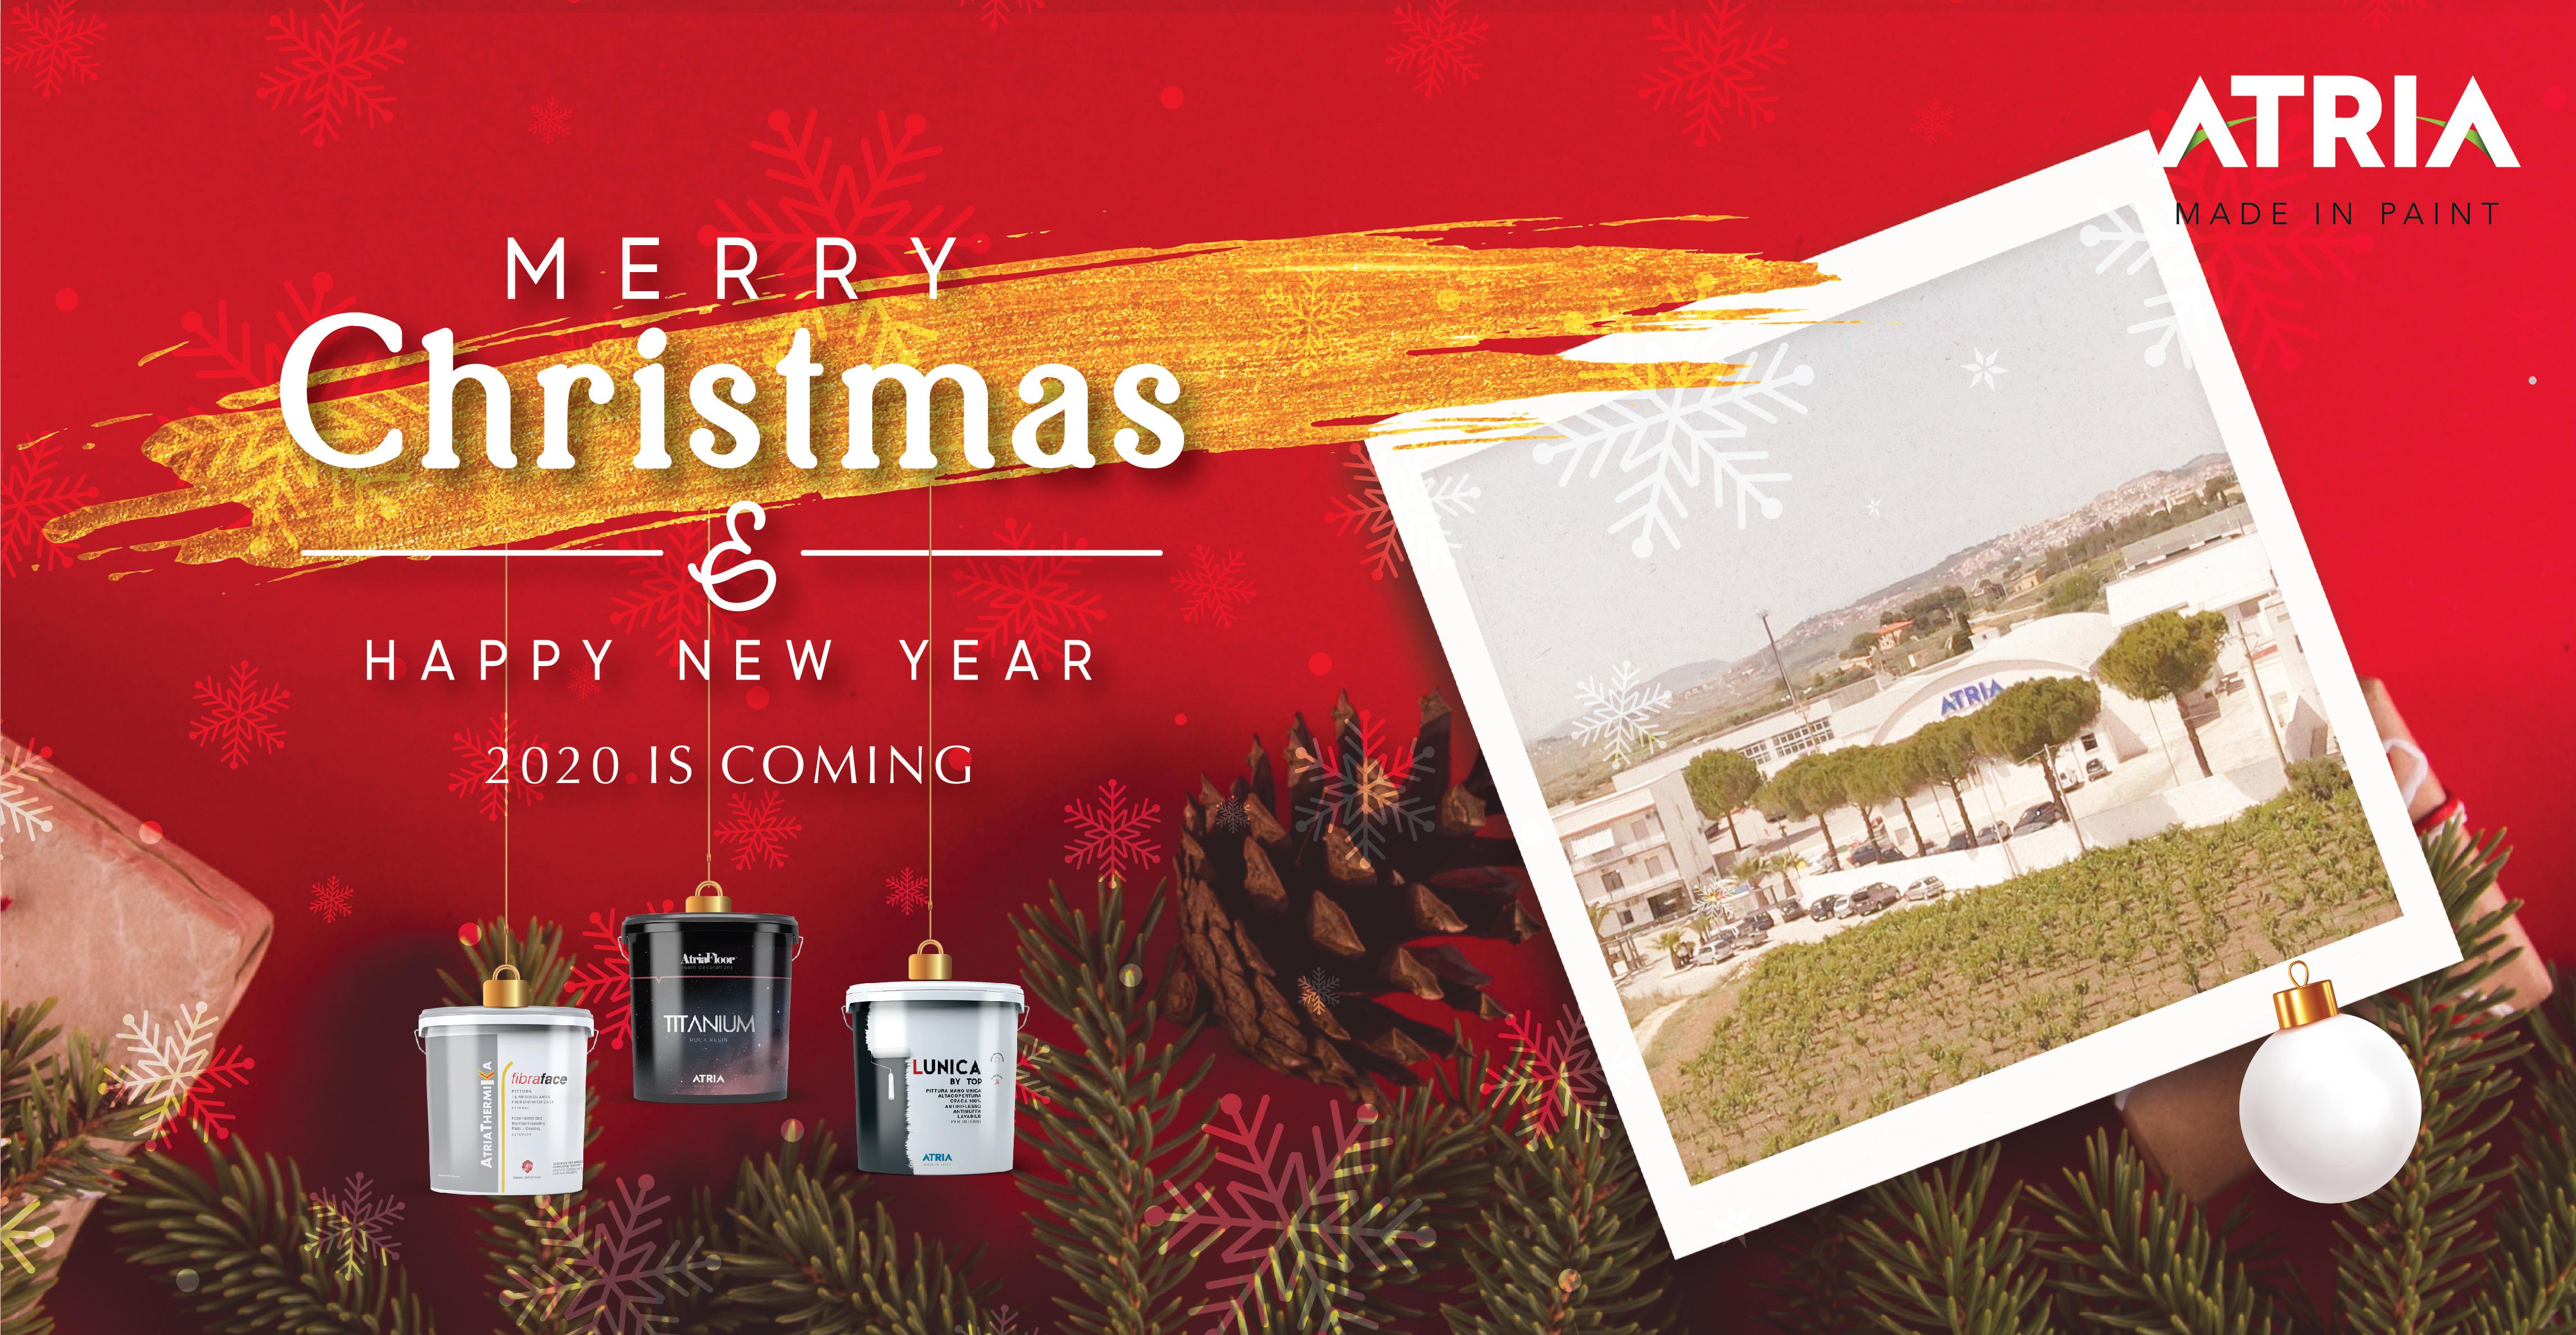 HAPPY CHRISTMAS HOLIDAYS!